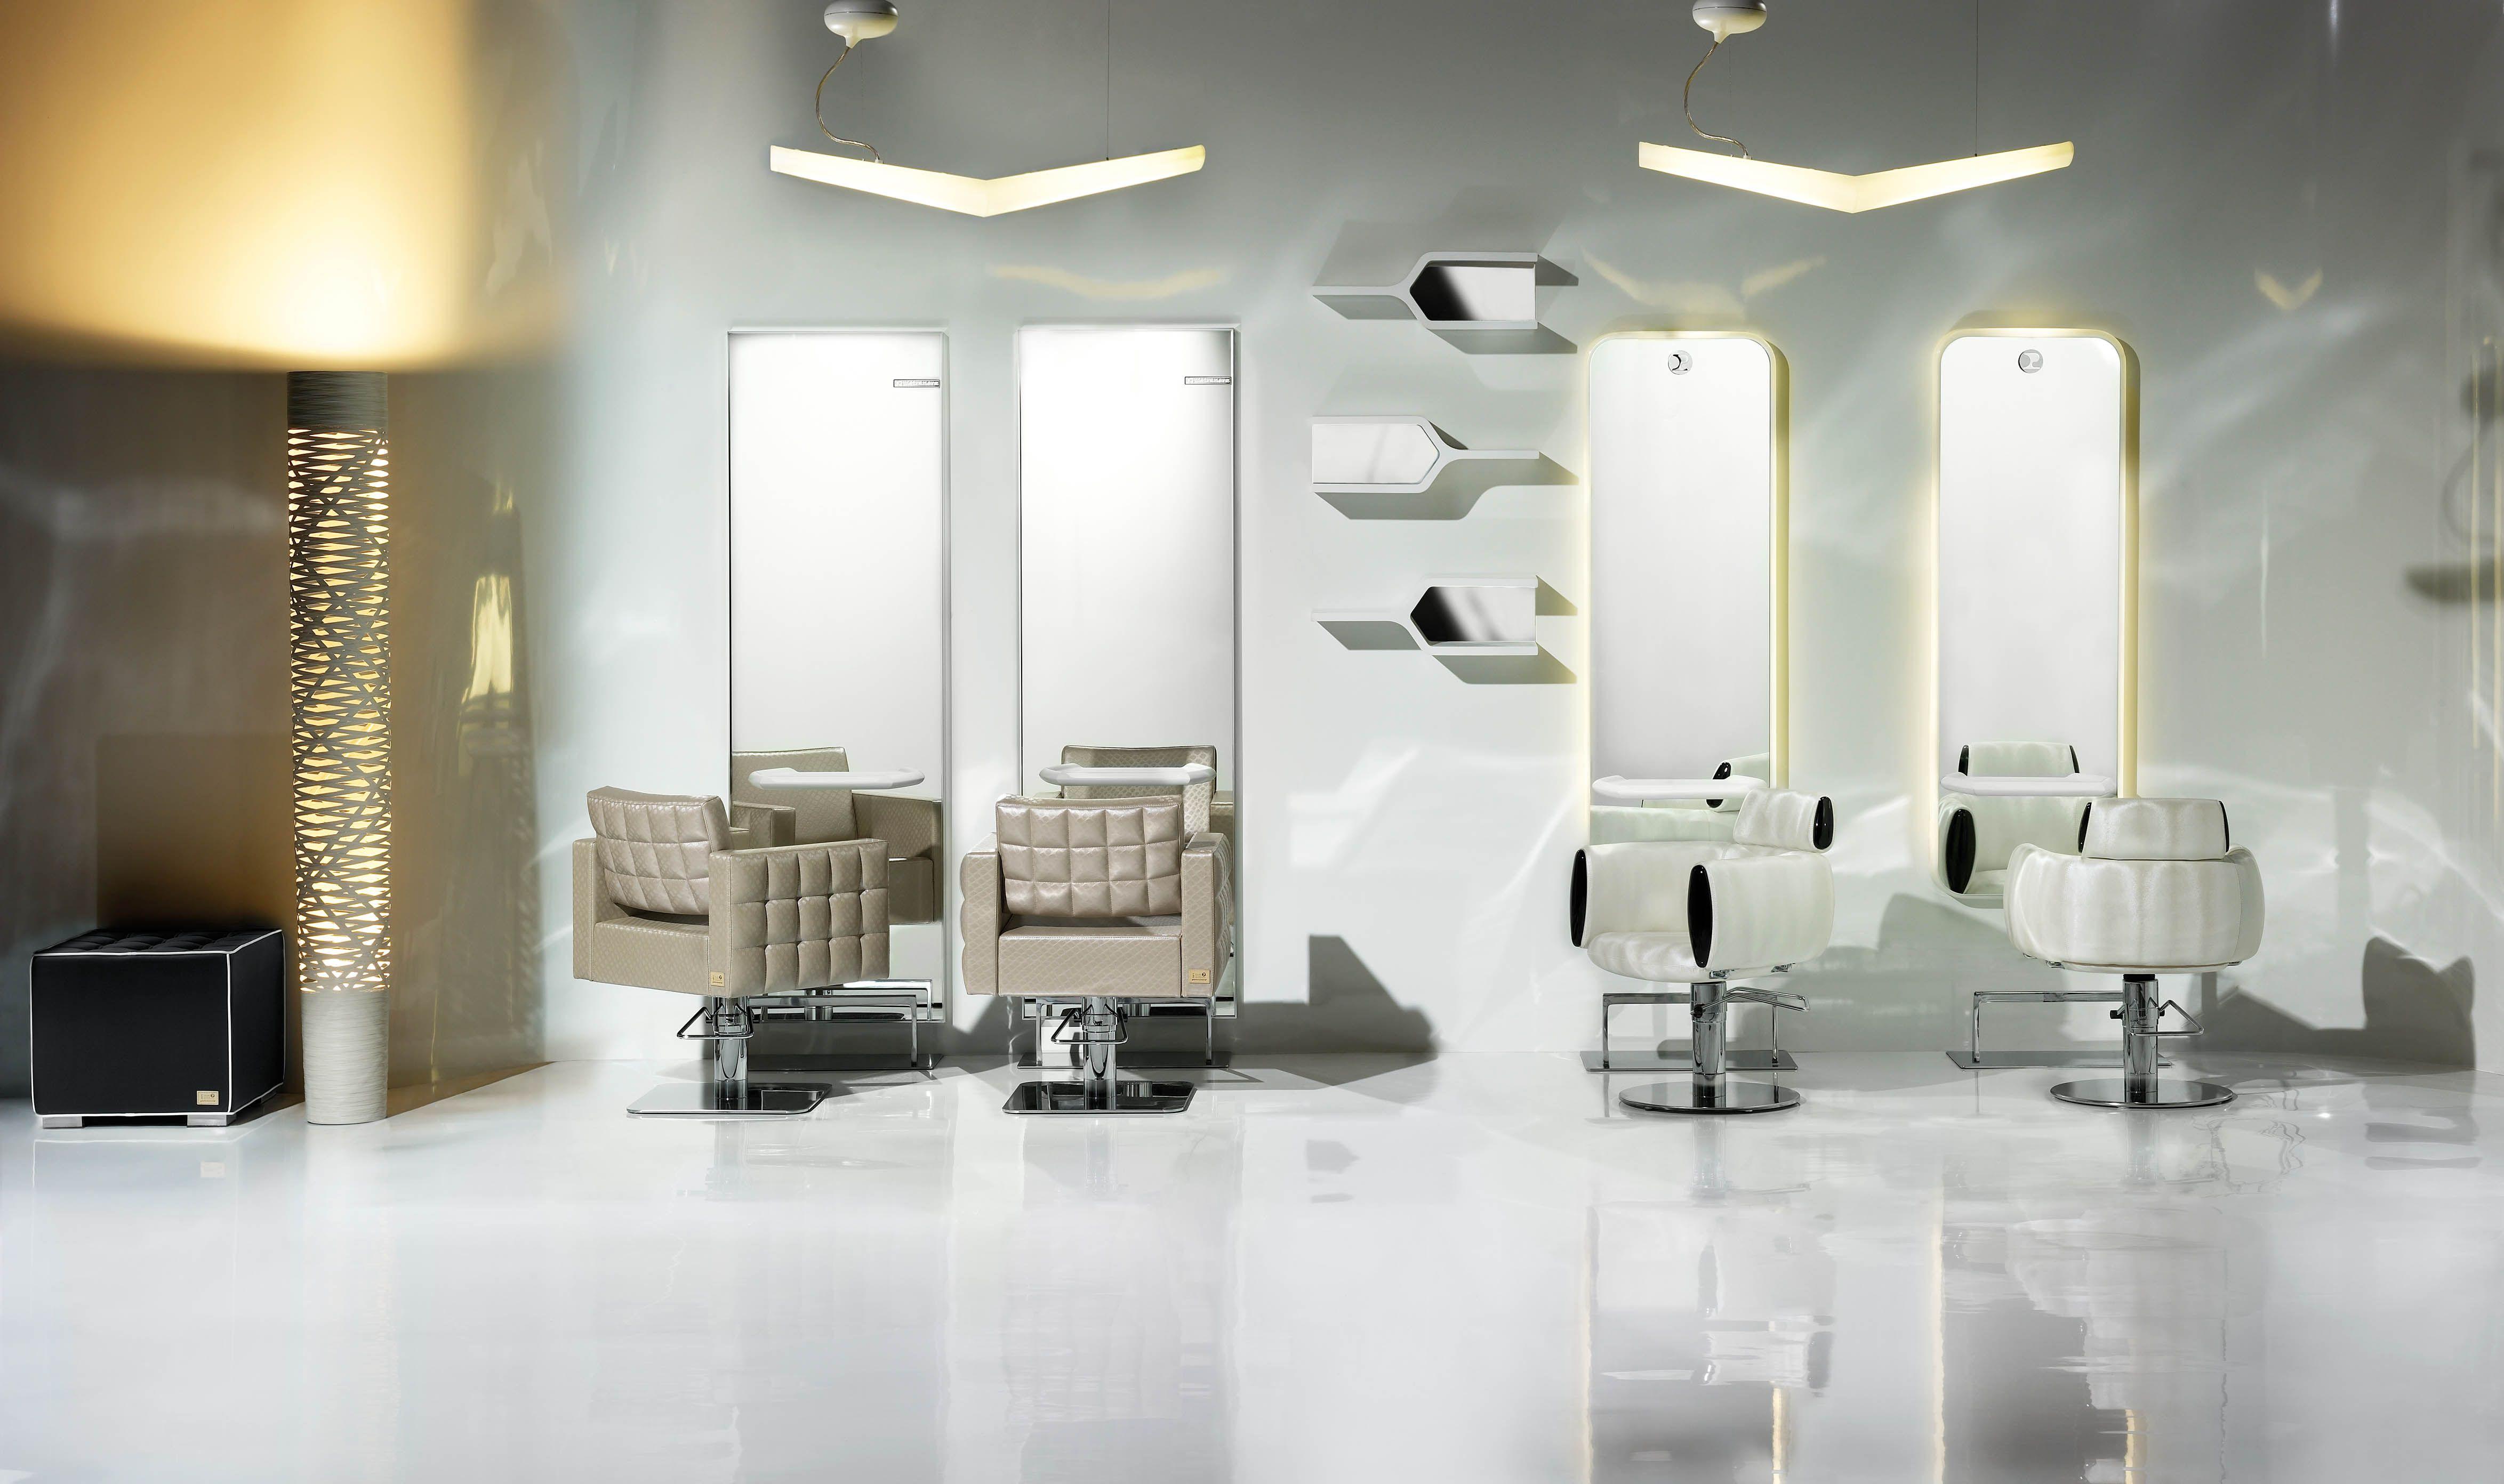 Arredamento moderno vintage arredamento with arredamento for Arredamento parrucchieri outlet